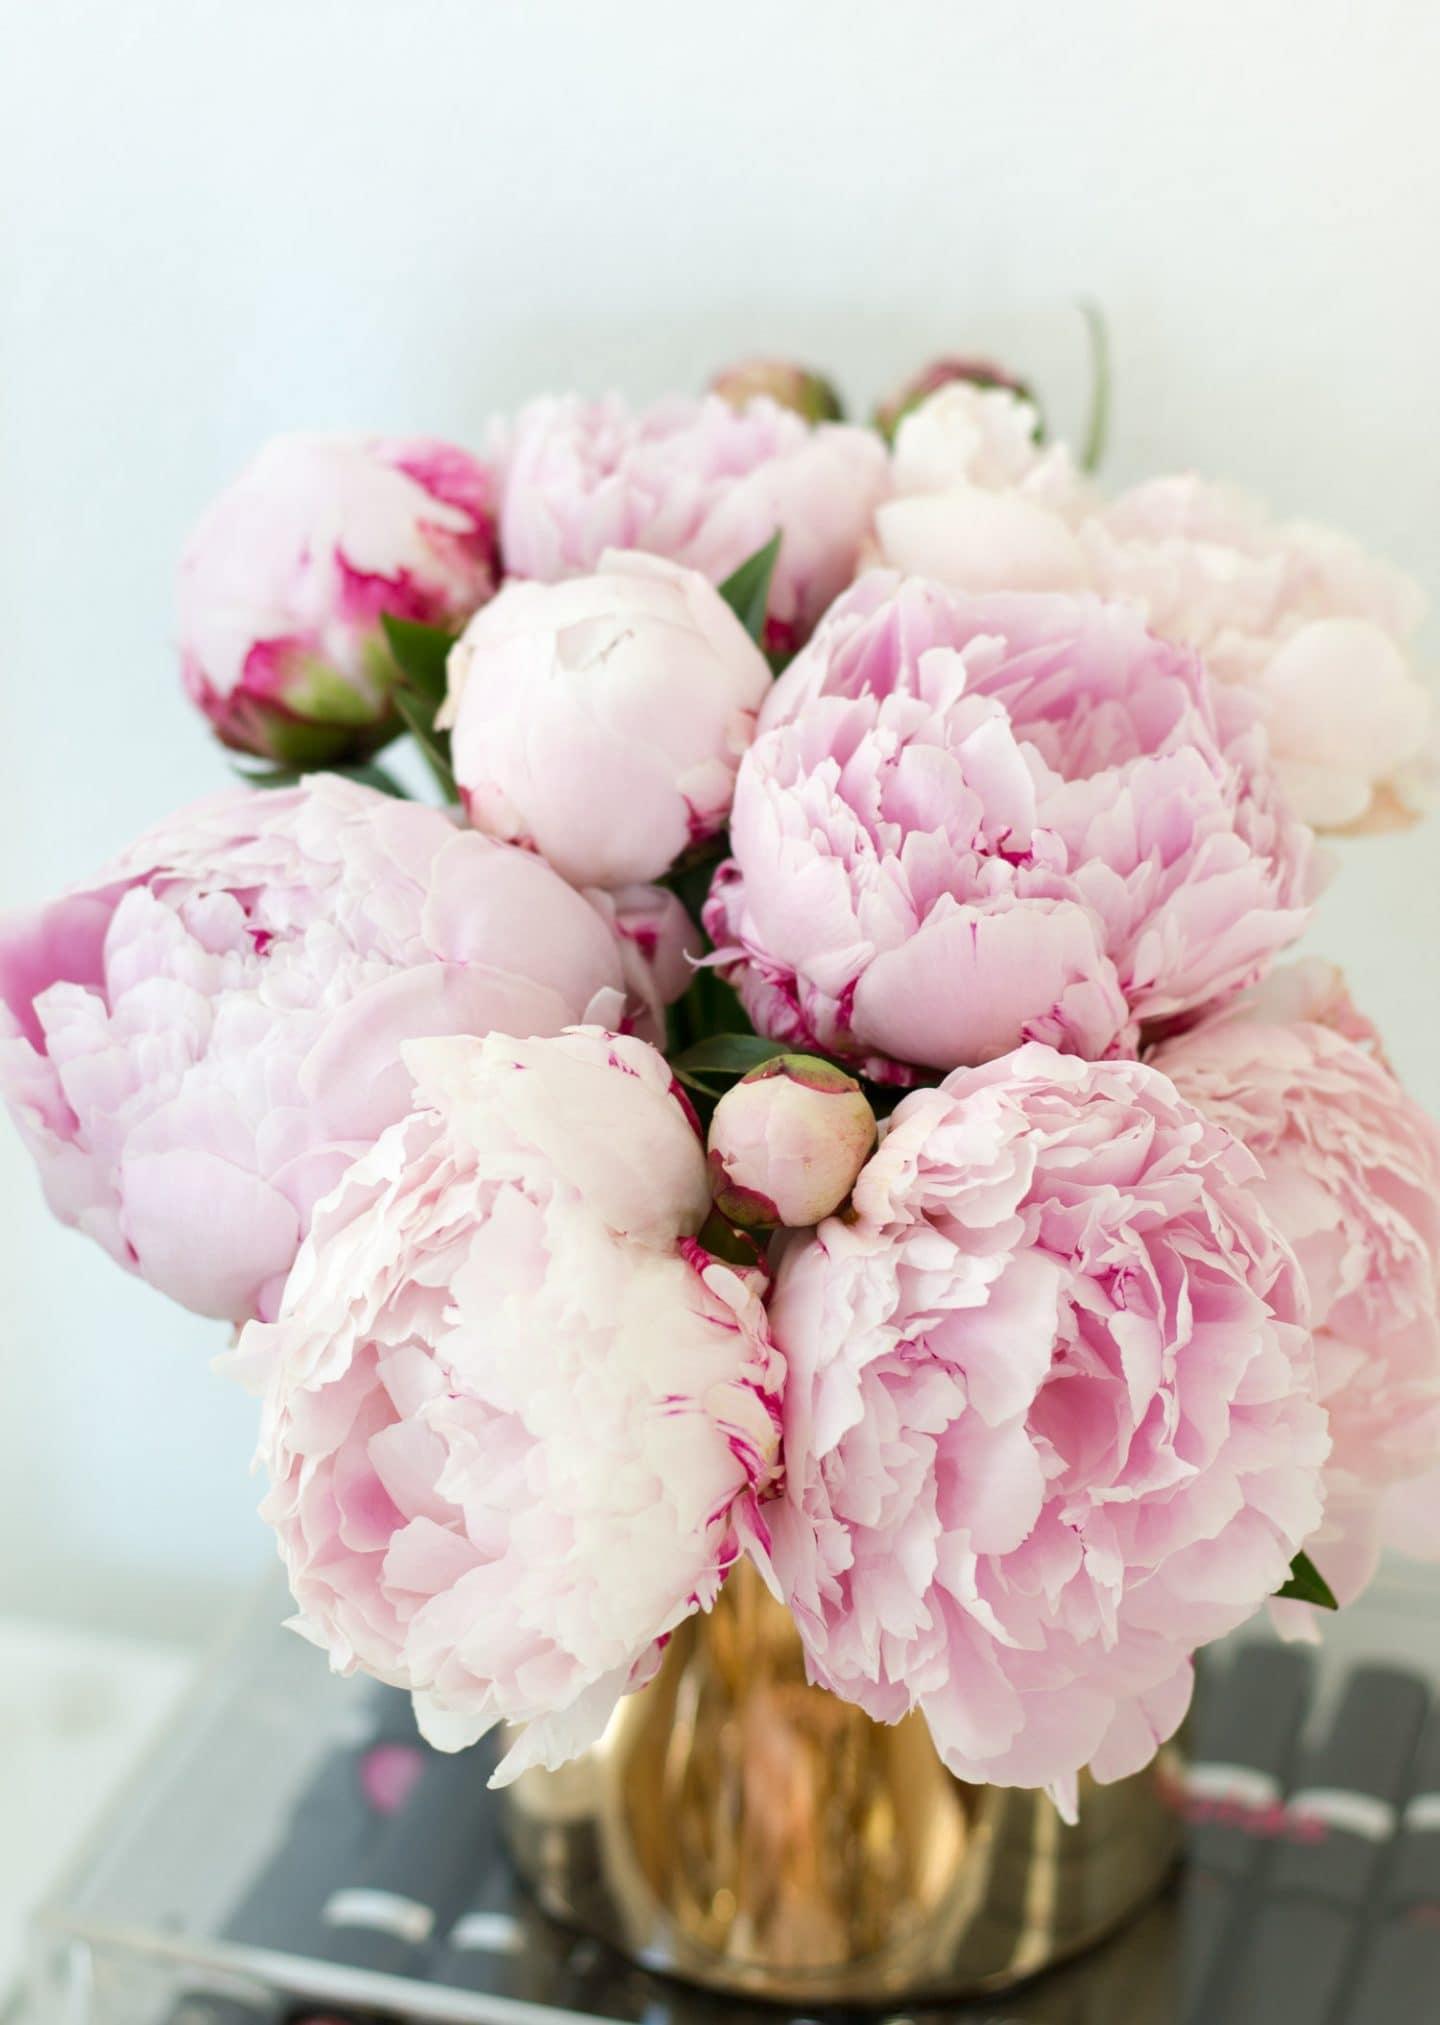 valspar home office tour ashley brooke nicholas cute office inspiration target style pretty flowers